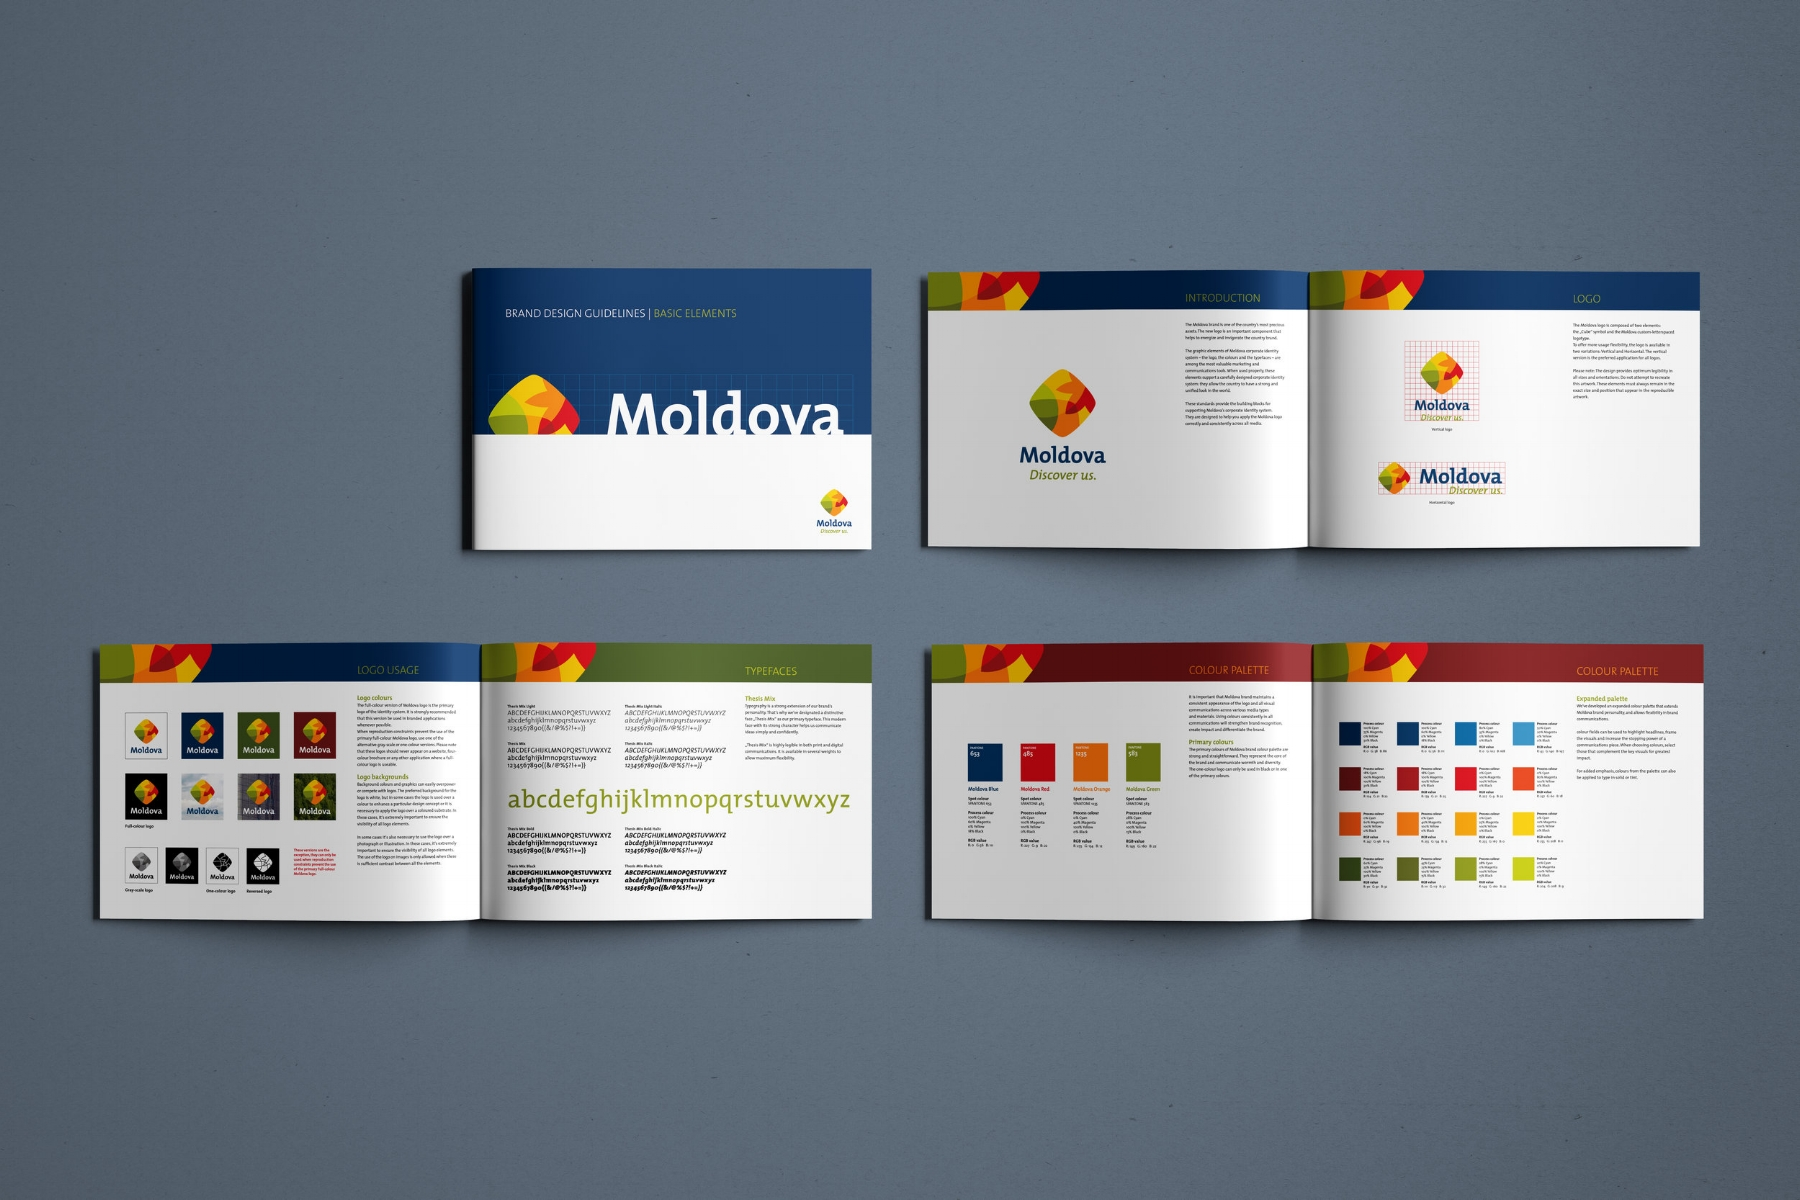 Moldova Country Branding